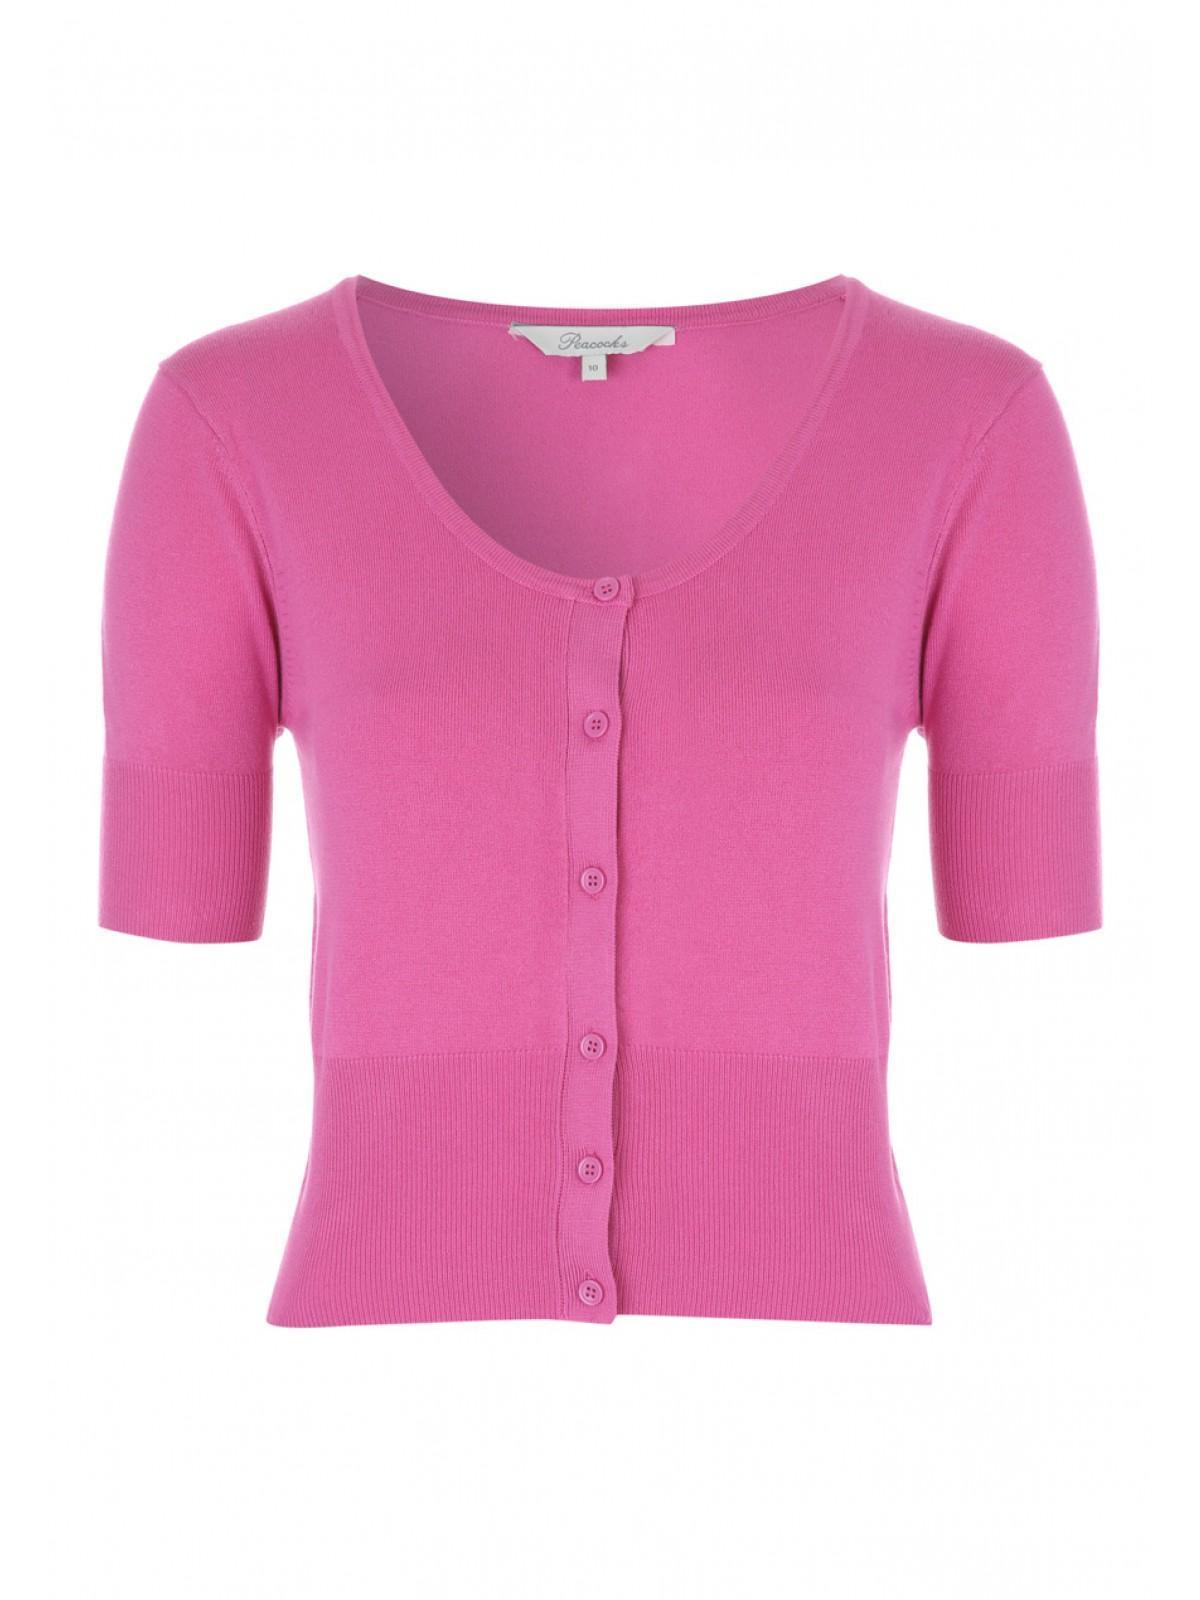 Womens Pink Basic Cropped Cardigan | Peacocks